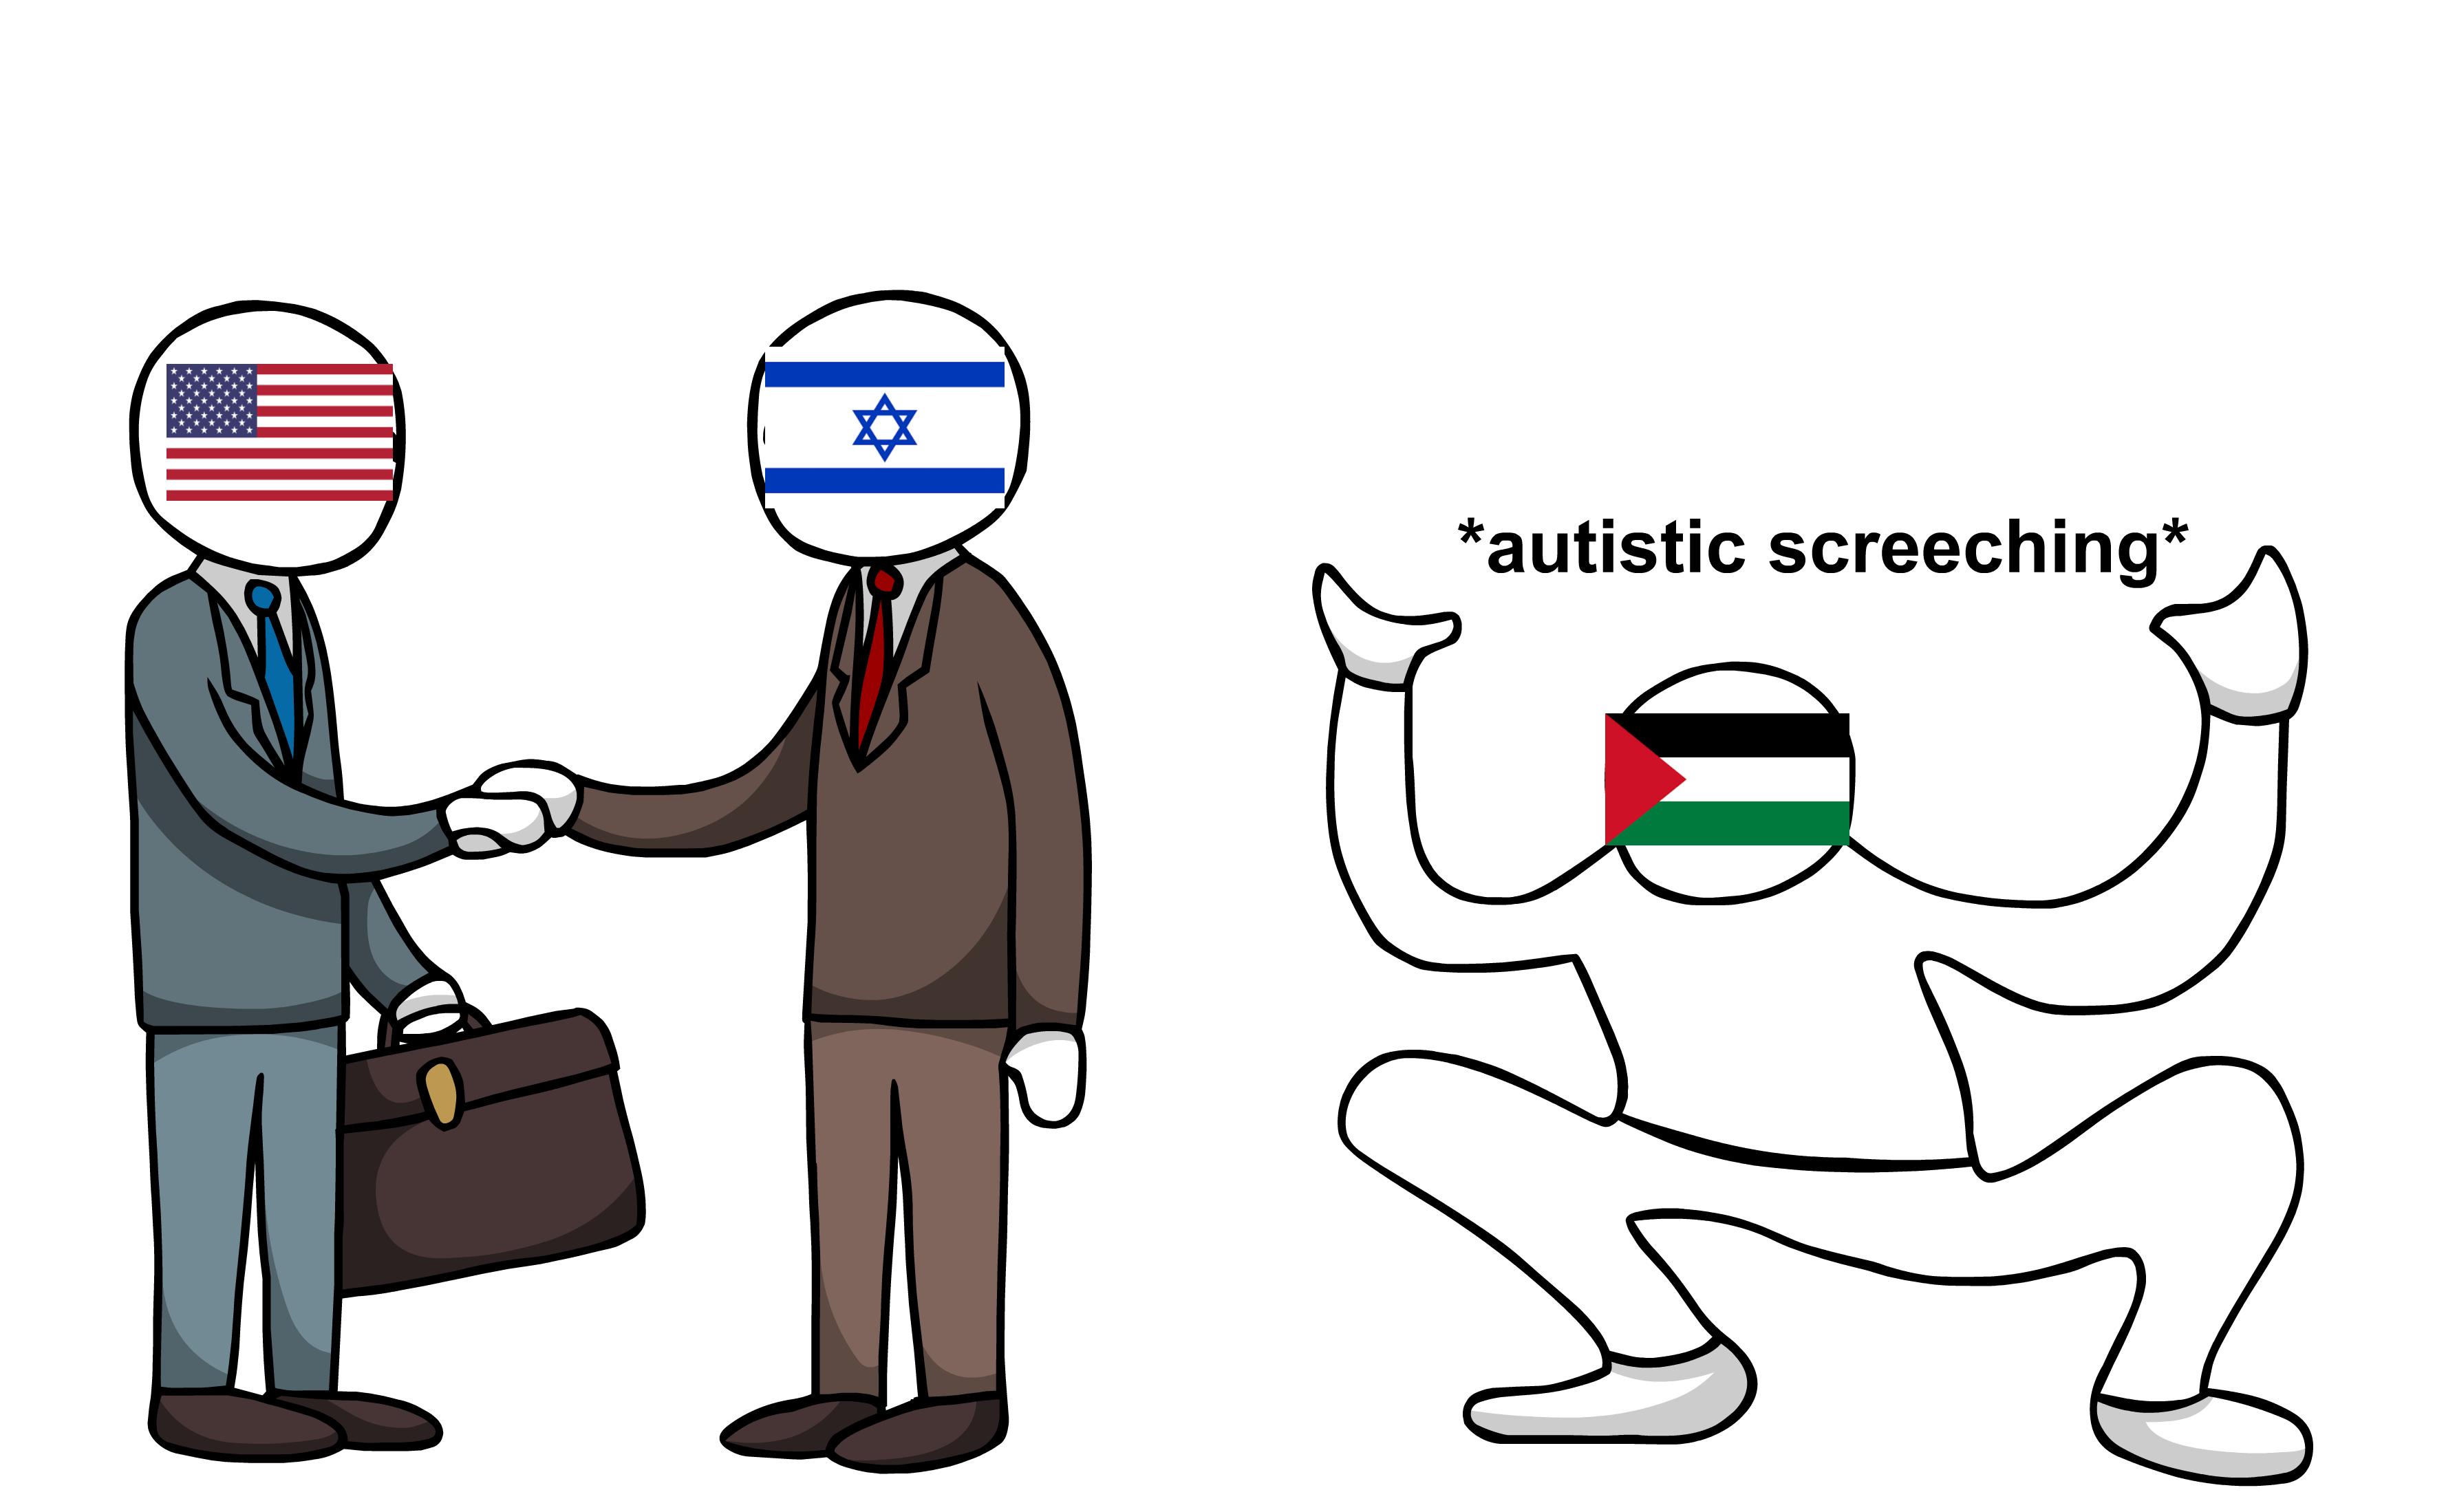 Summarizing Israel-Palestine conflict